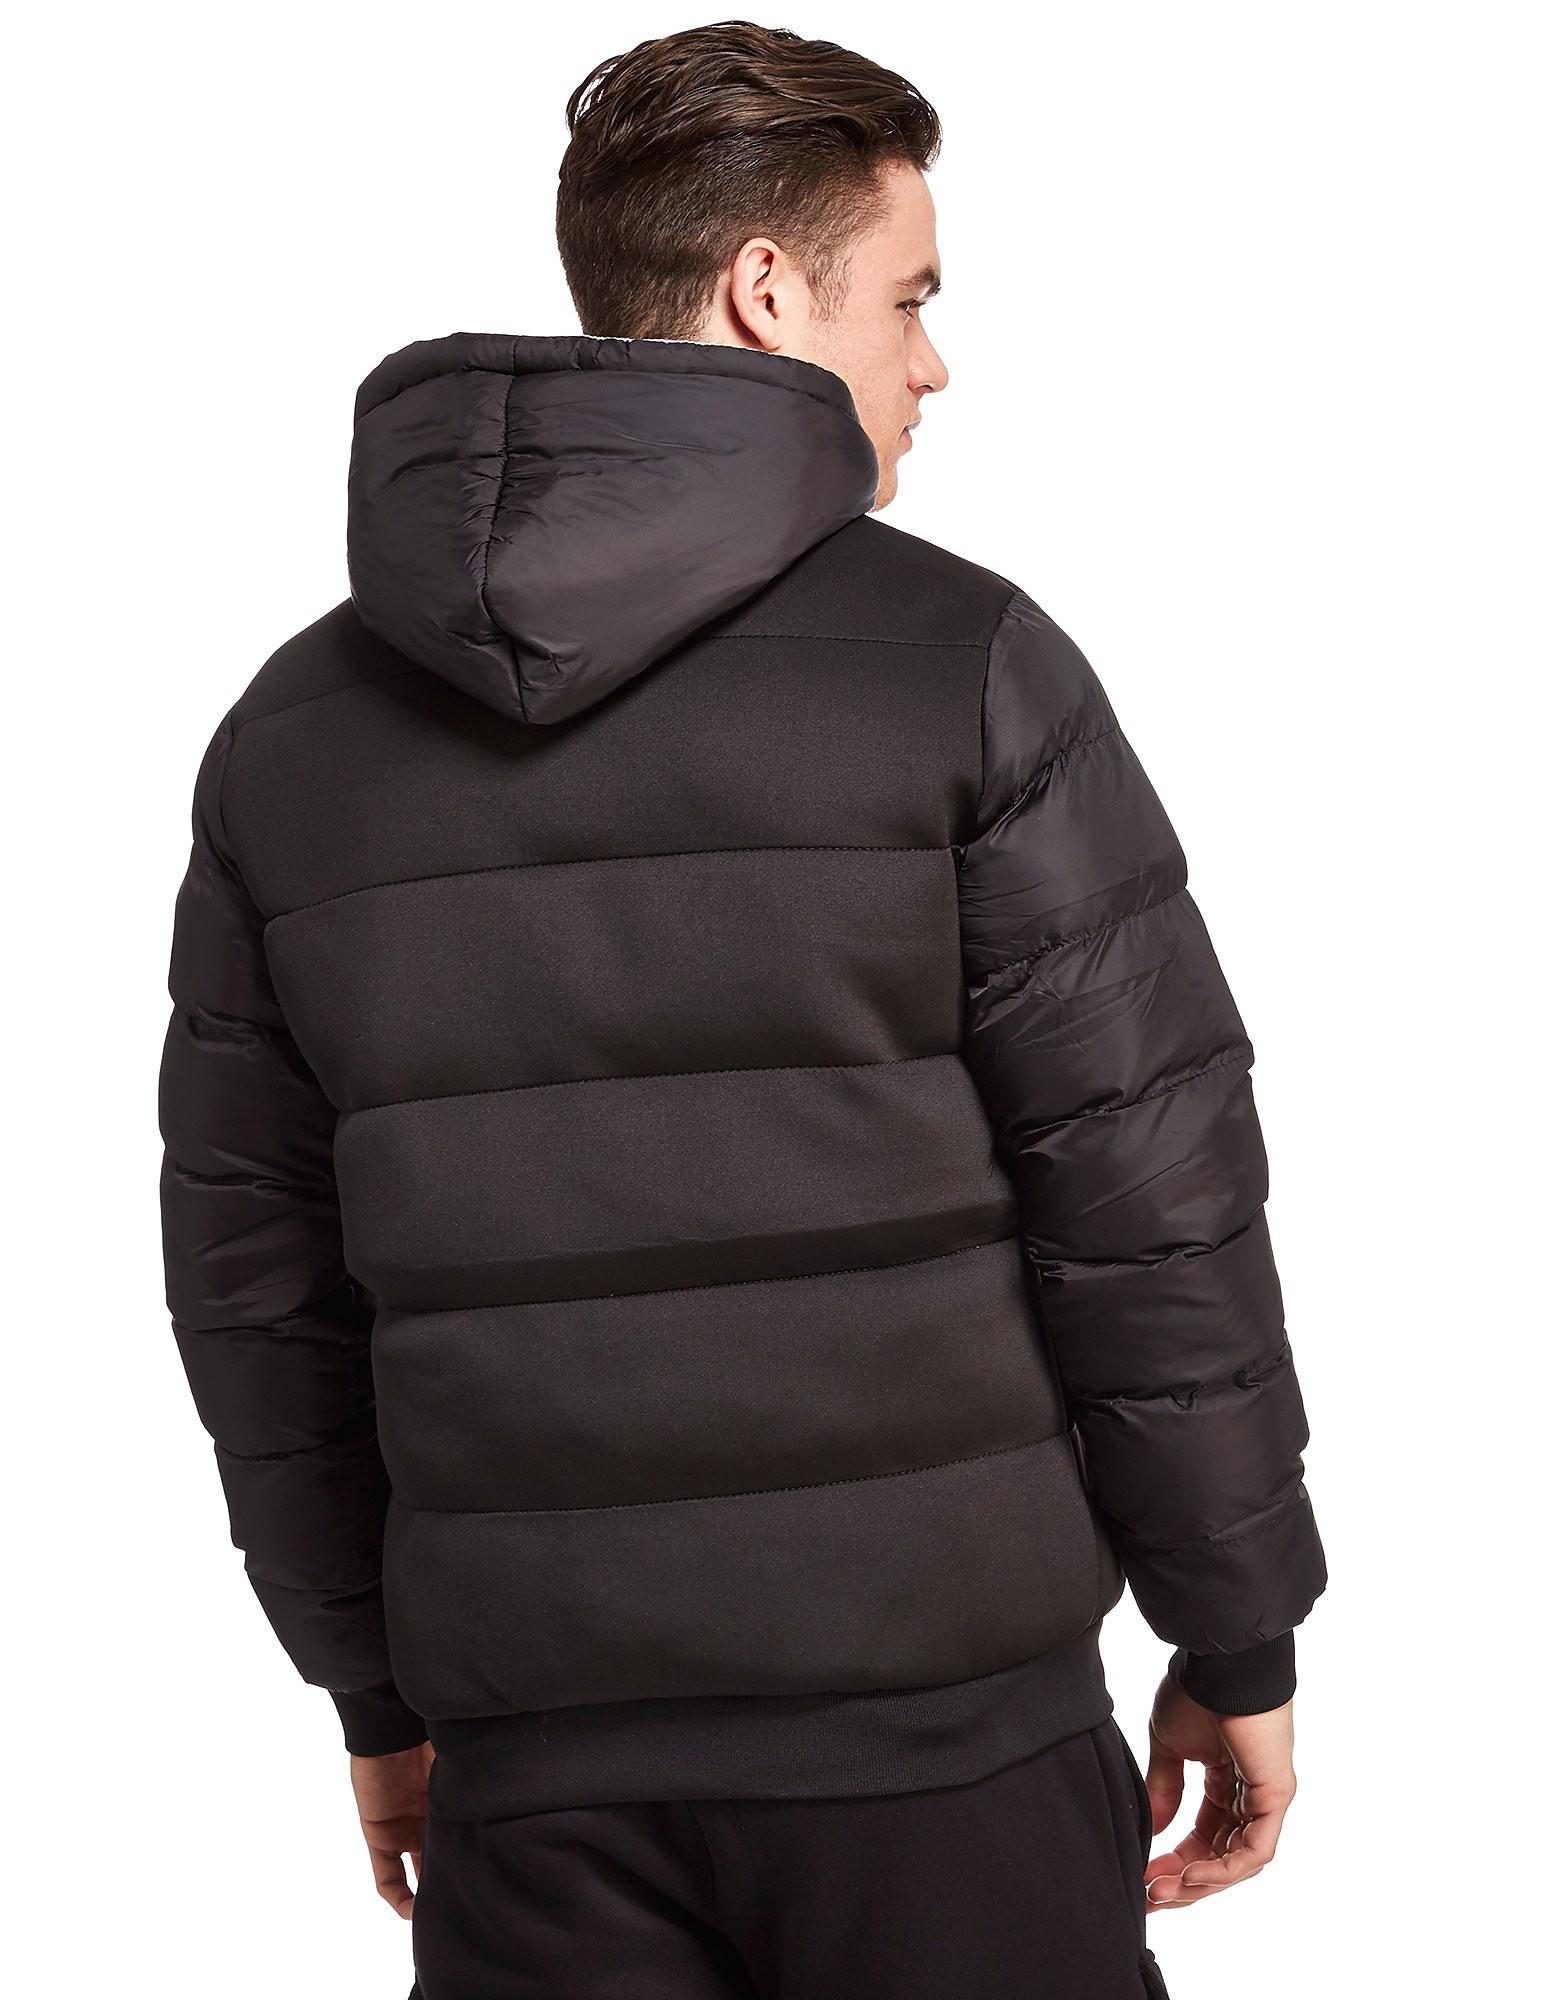 Supply & Demand Tear Jacket